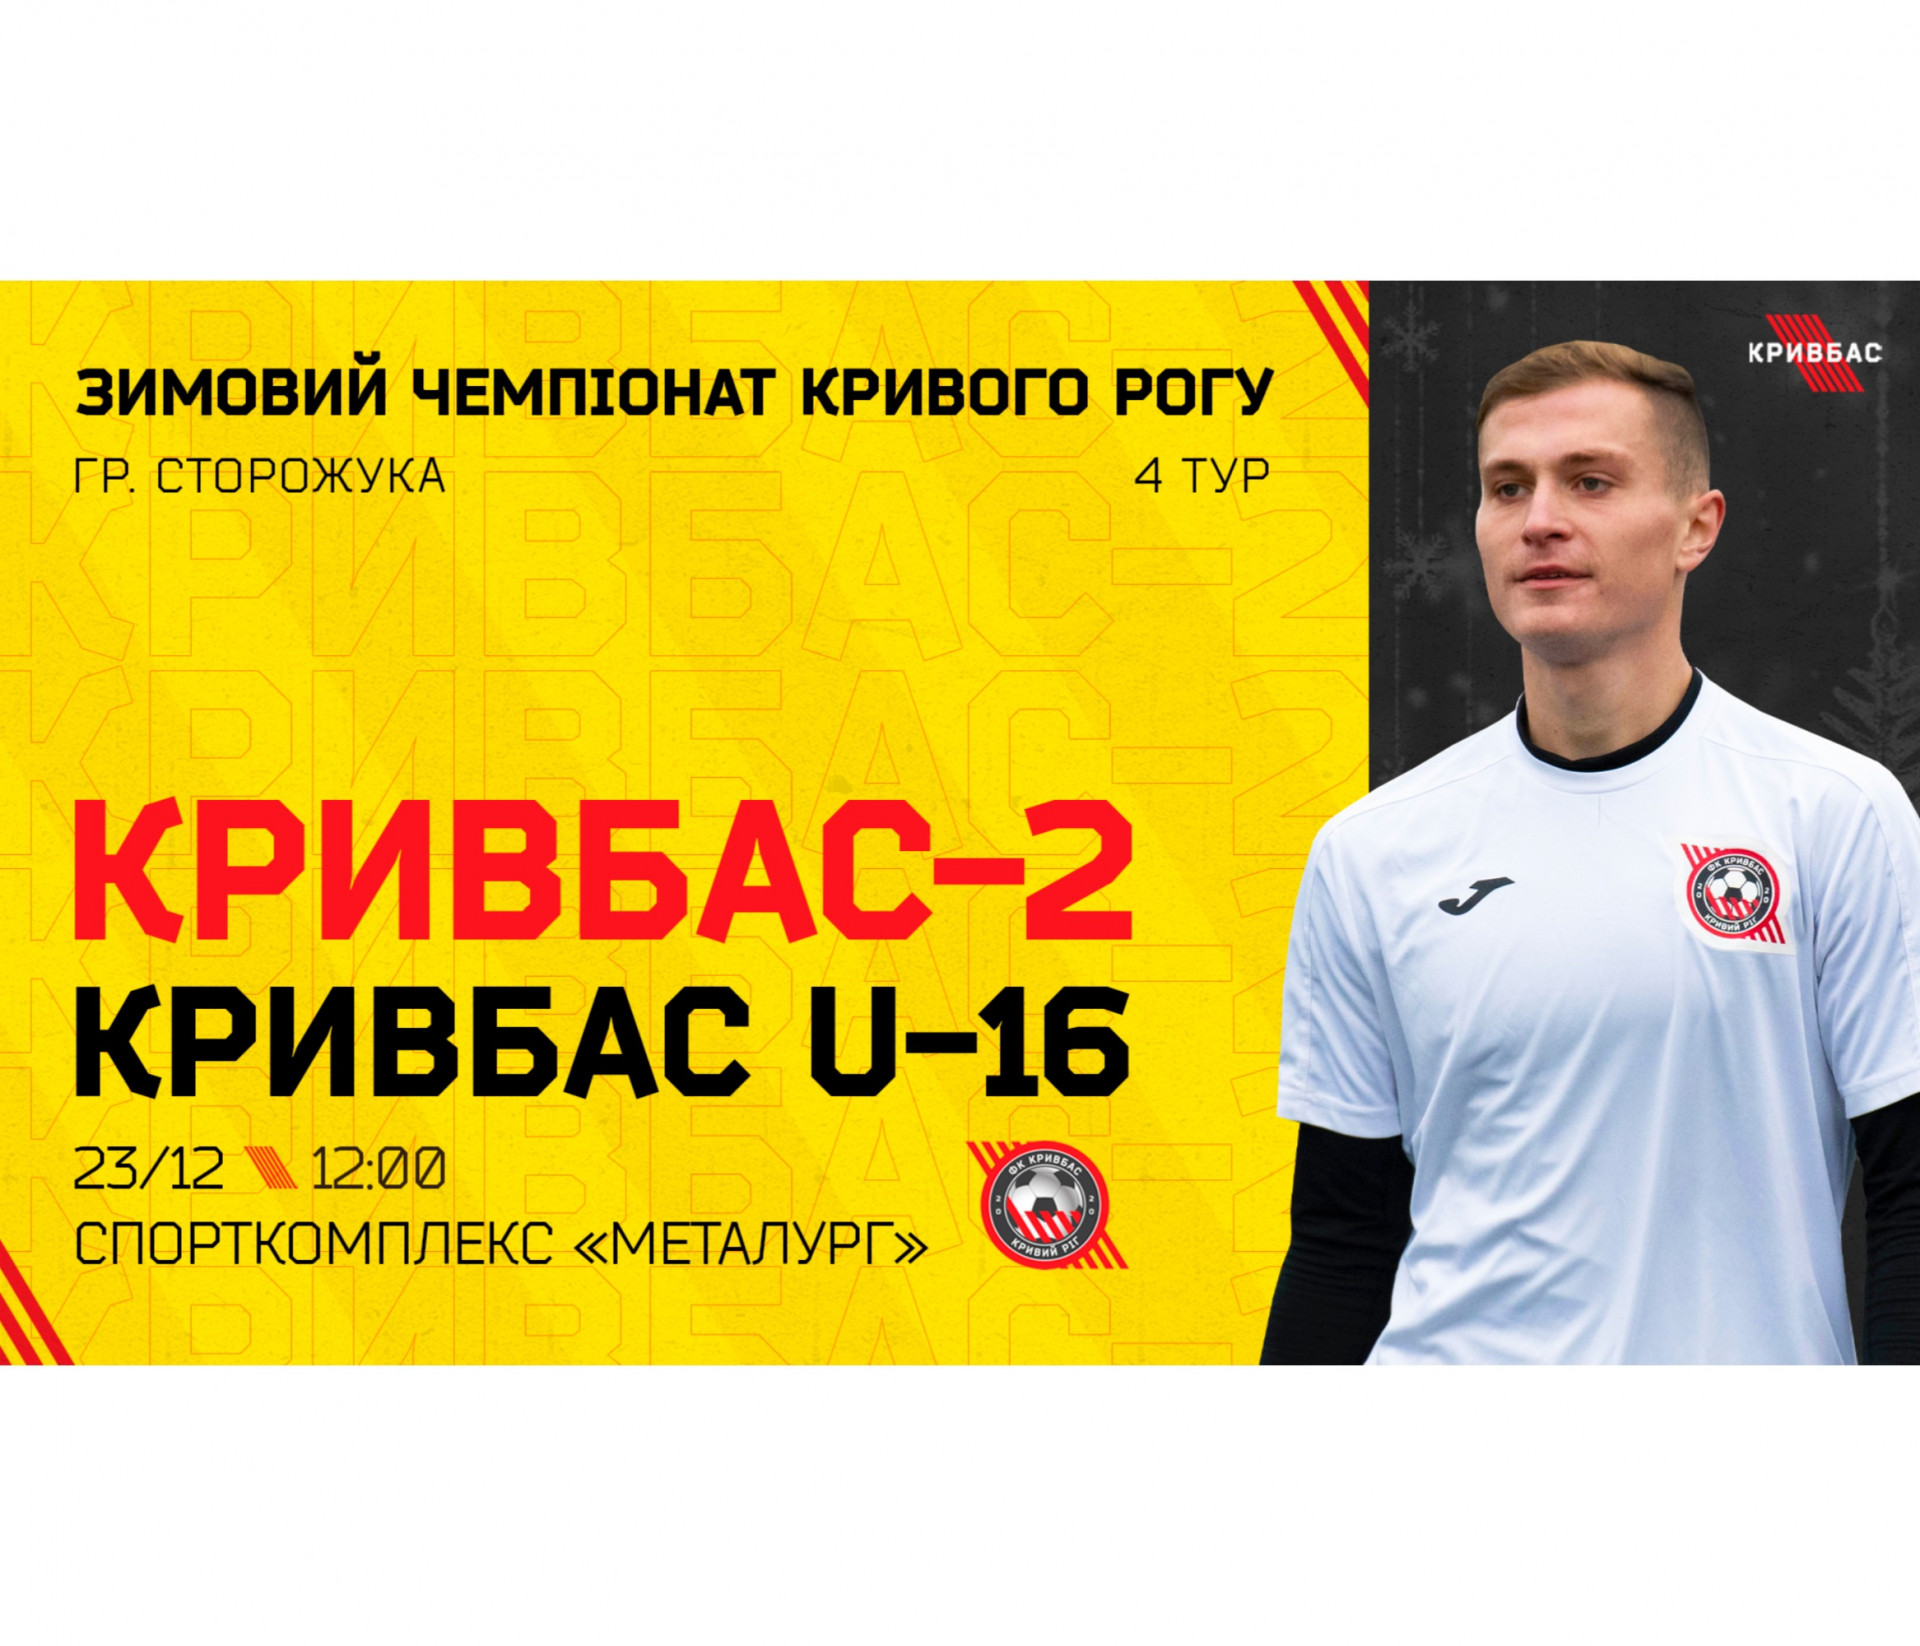 """Кривбас-2"" - ""Кривбас"" U-16: 23 грудня о 12:00}"